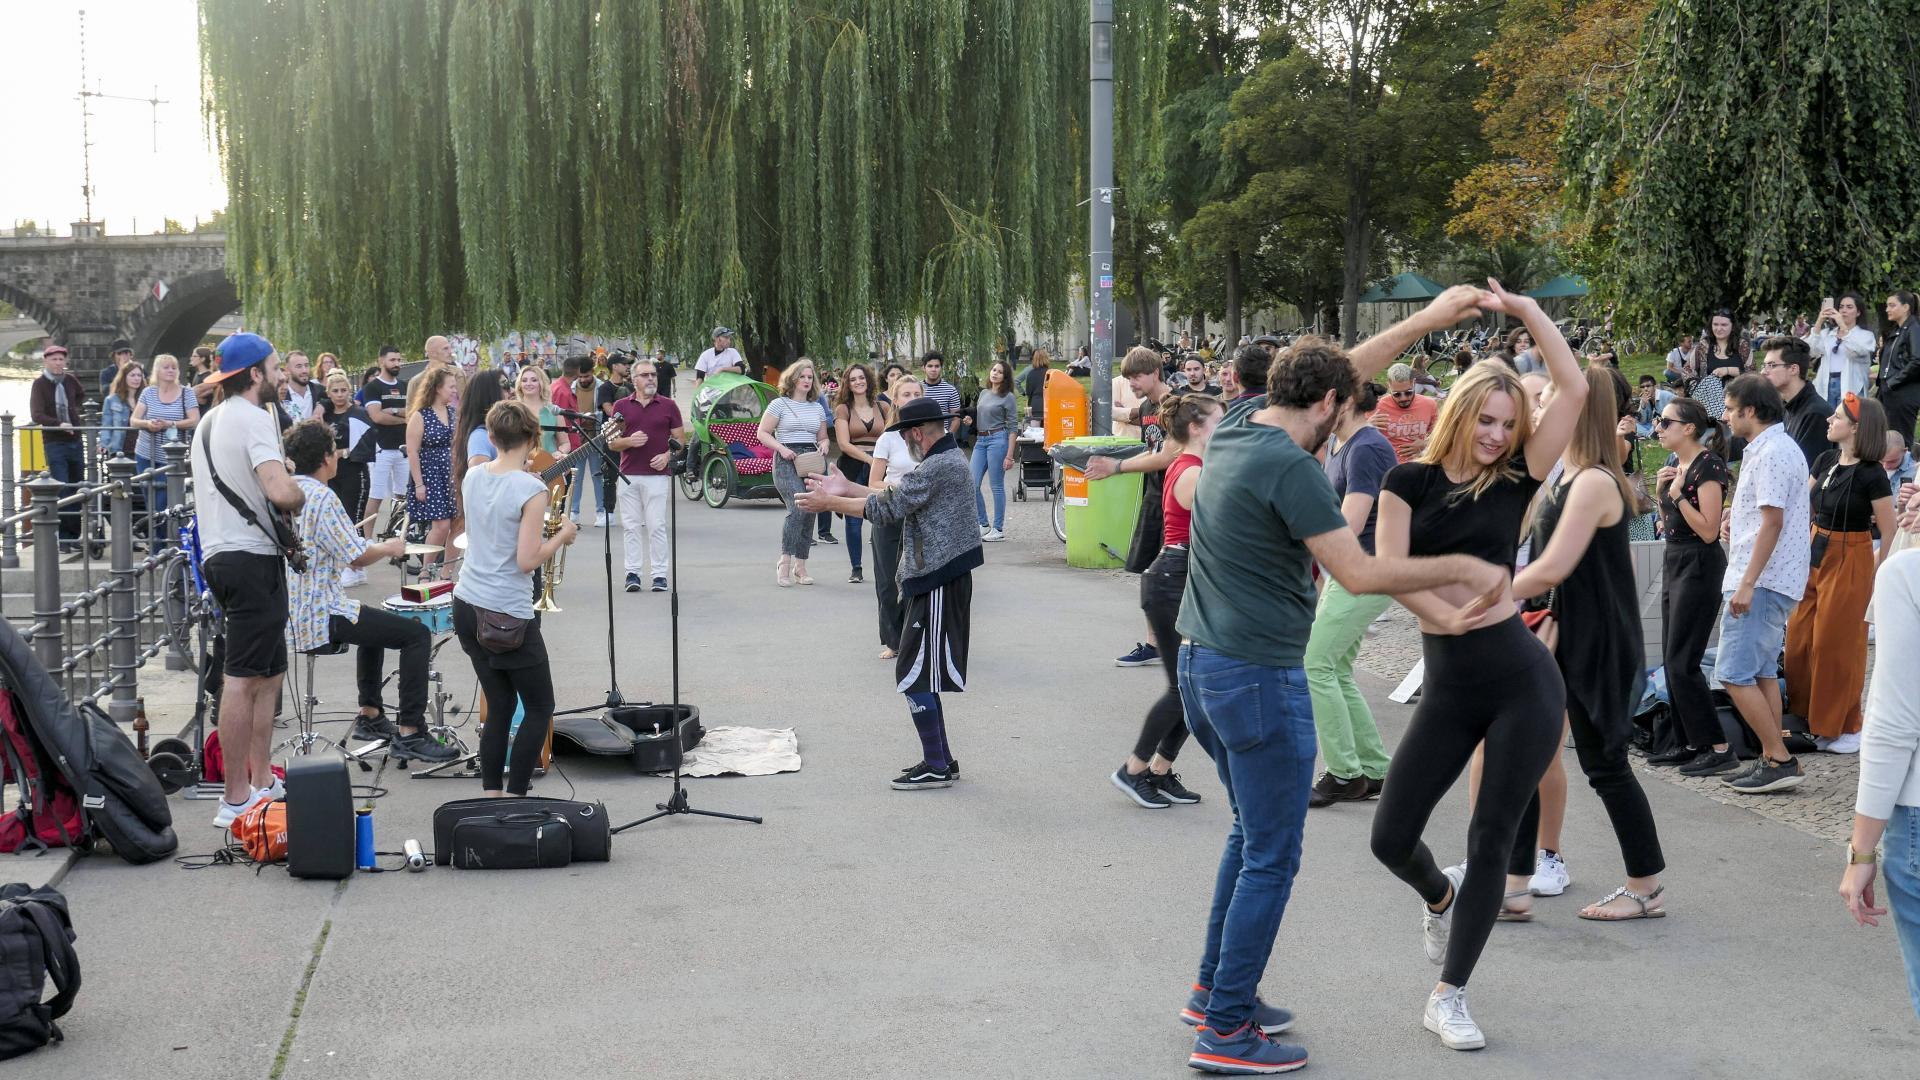 Strassenmusiker am James-Simon-Park, Berlin Mitte Strassenmusiker am James-Simon-Park an der Spree , Berlin Mitte *** St